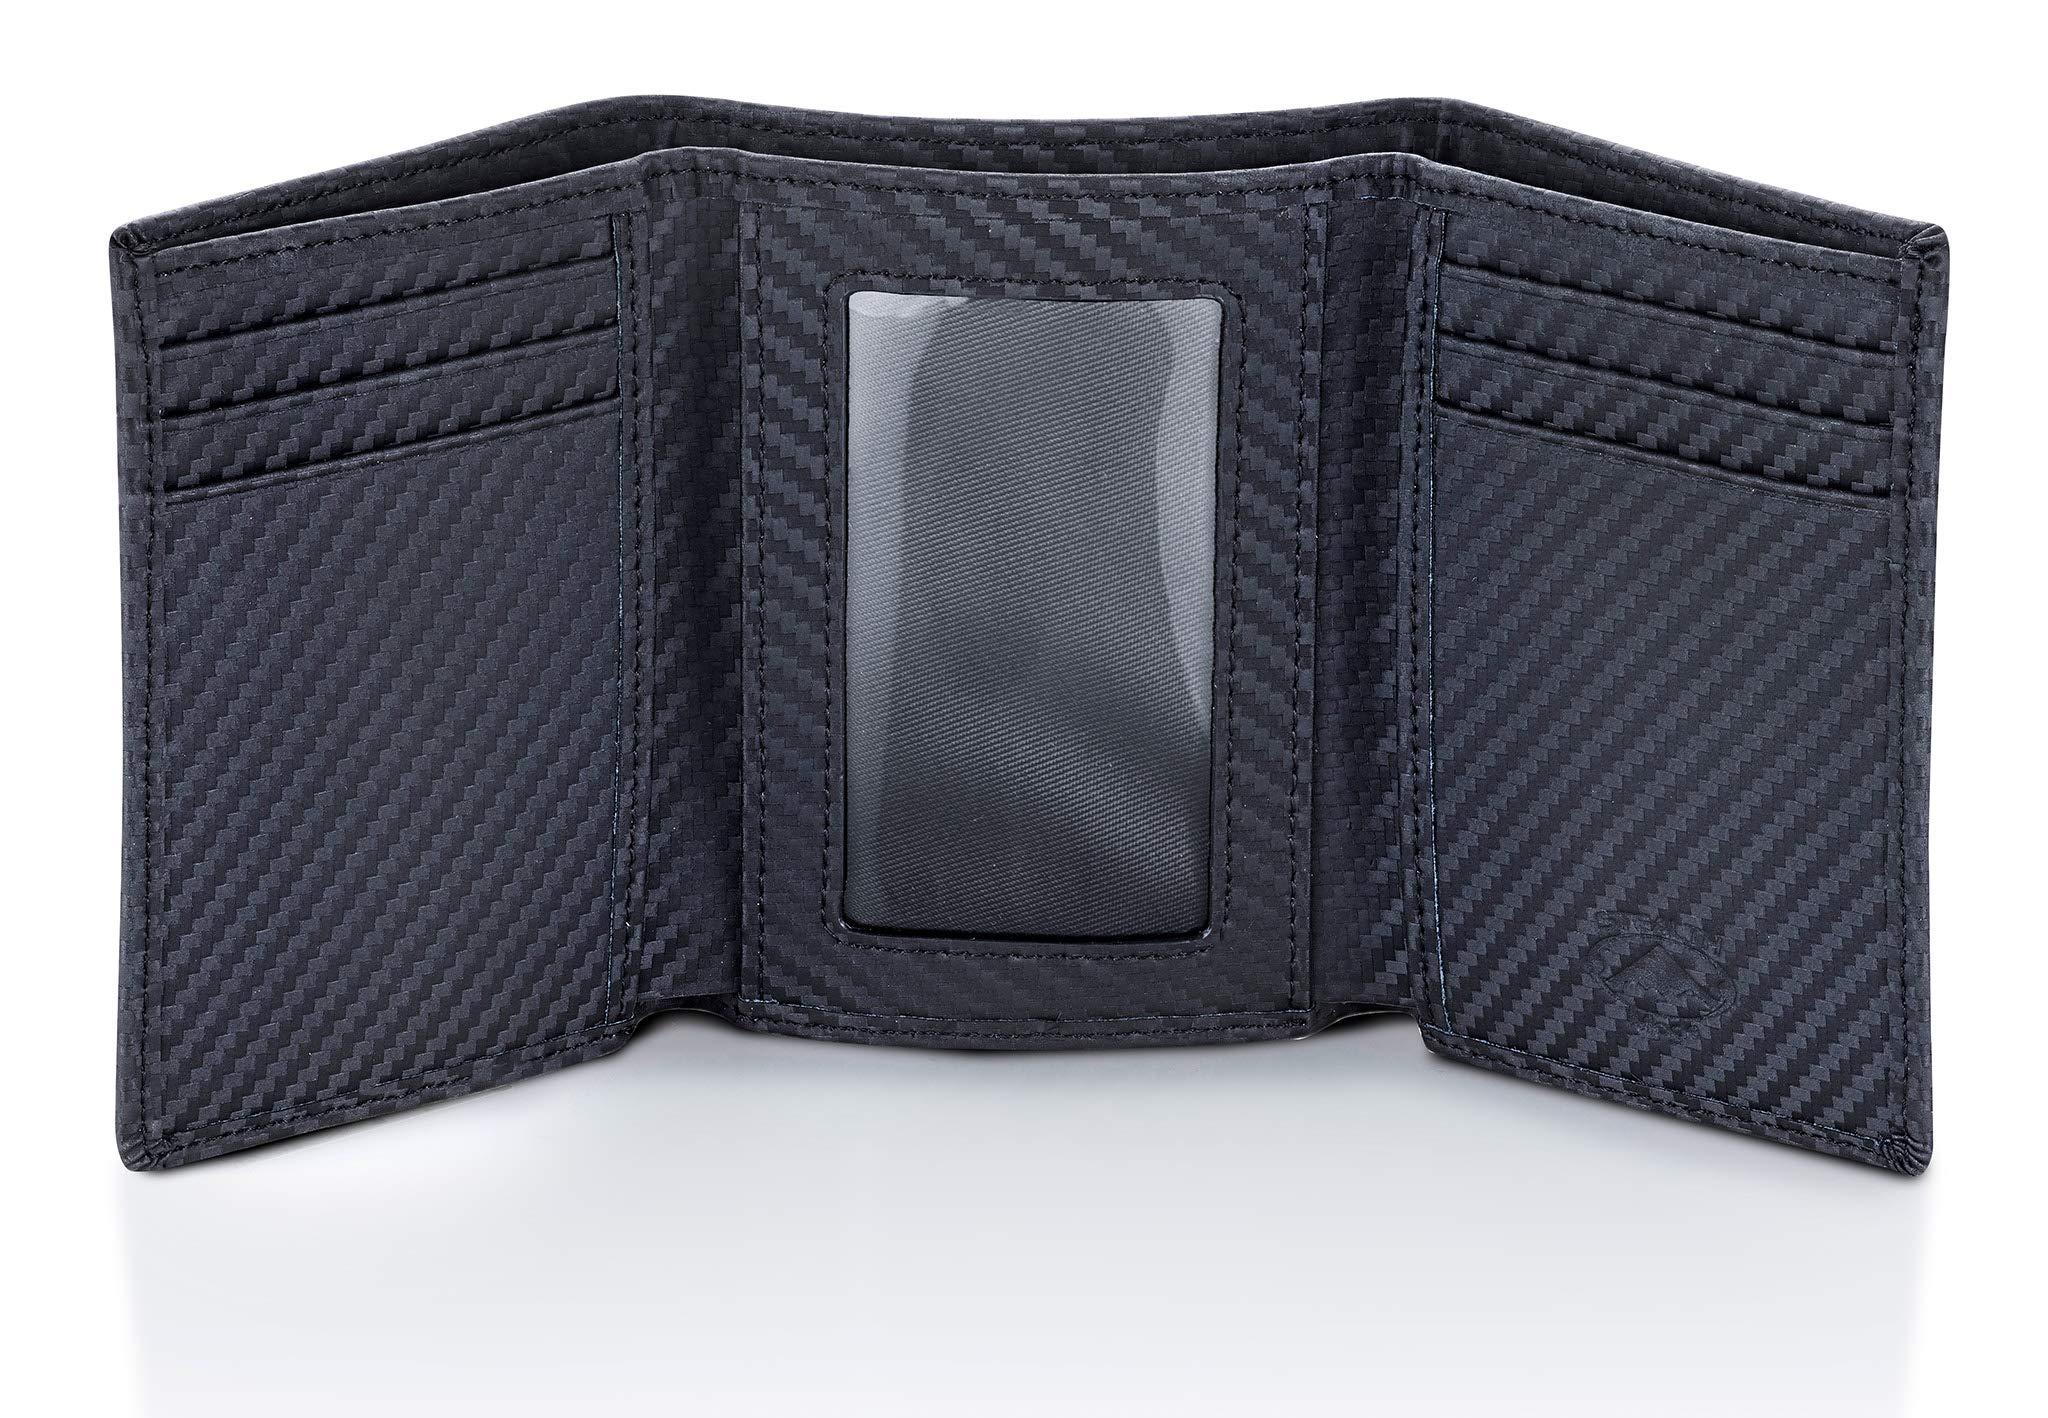 Stealth Mode Trifold RFID Blocking Carbon Fiber Wallet for Men by Stealth Mode (Image #1)